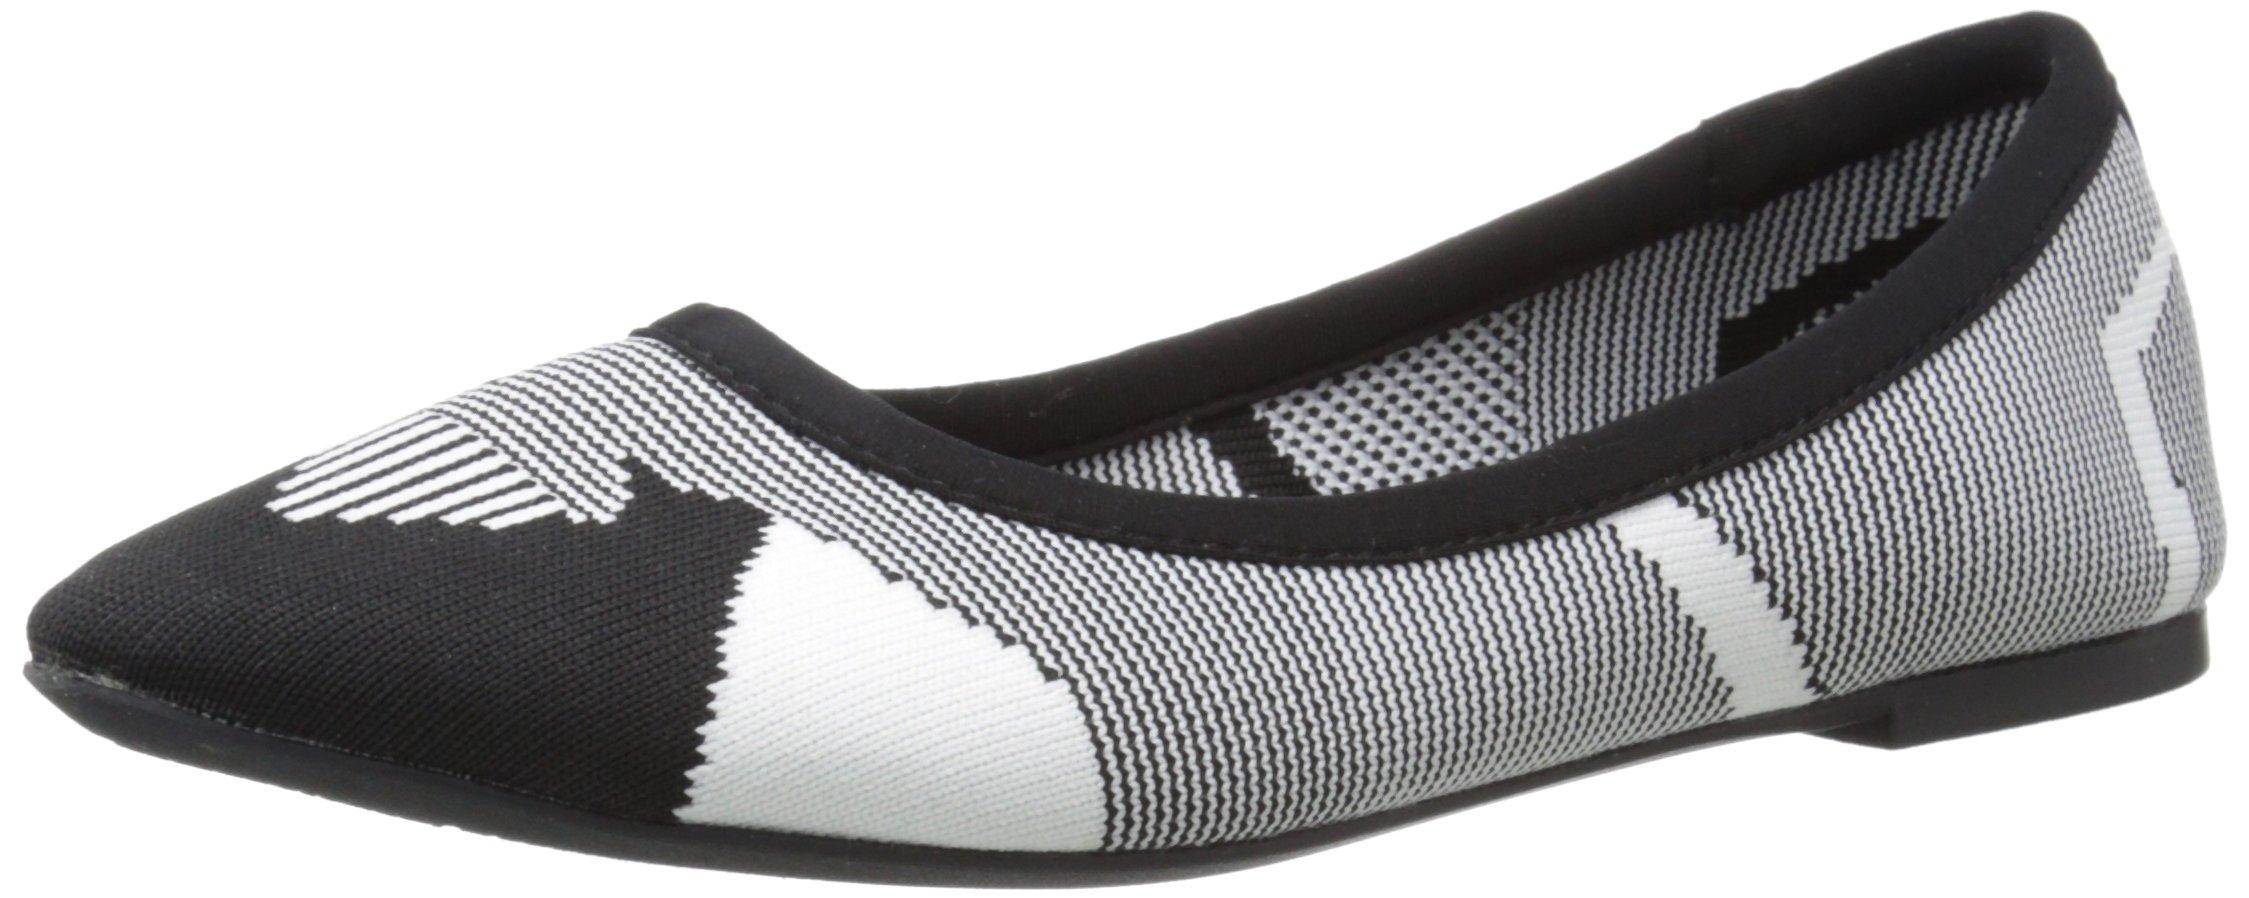 Skechers Women's Cleo Wham Flat, Black/White, 9 M US